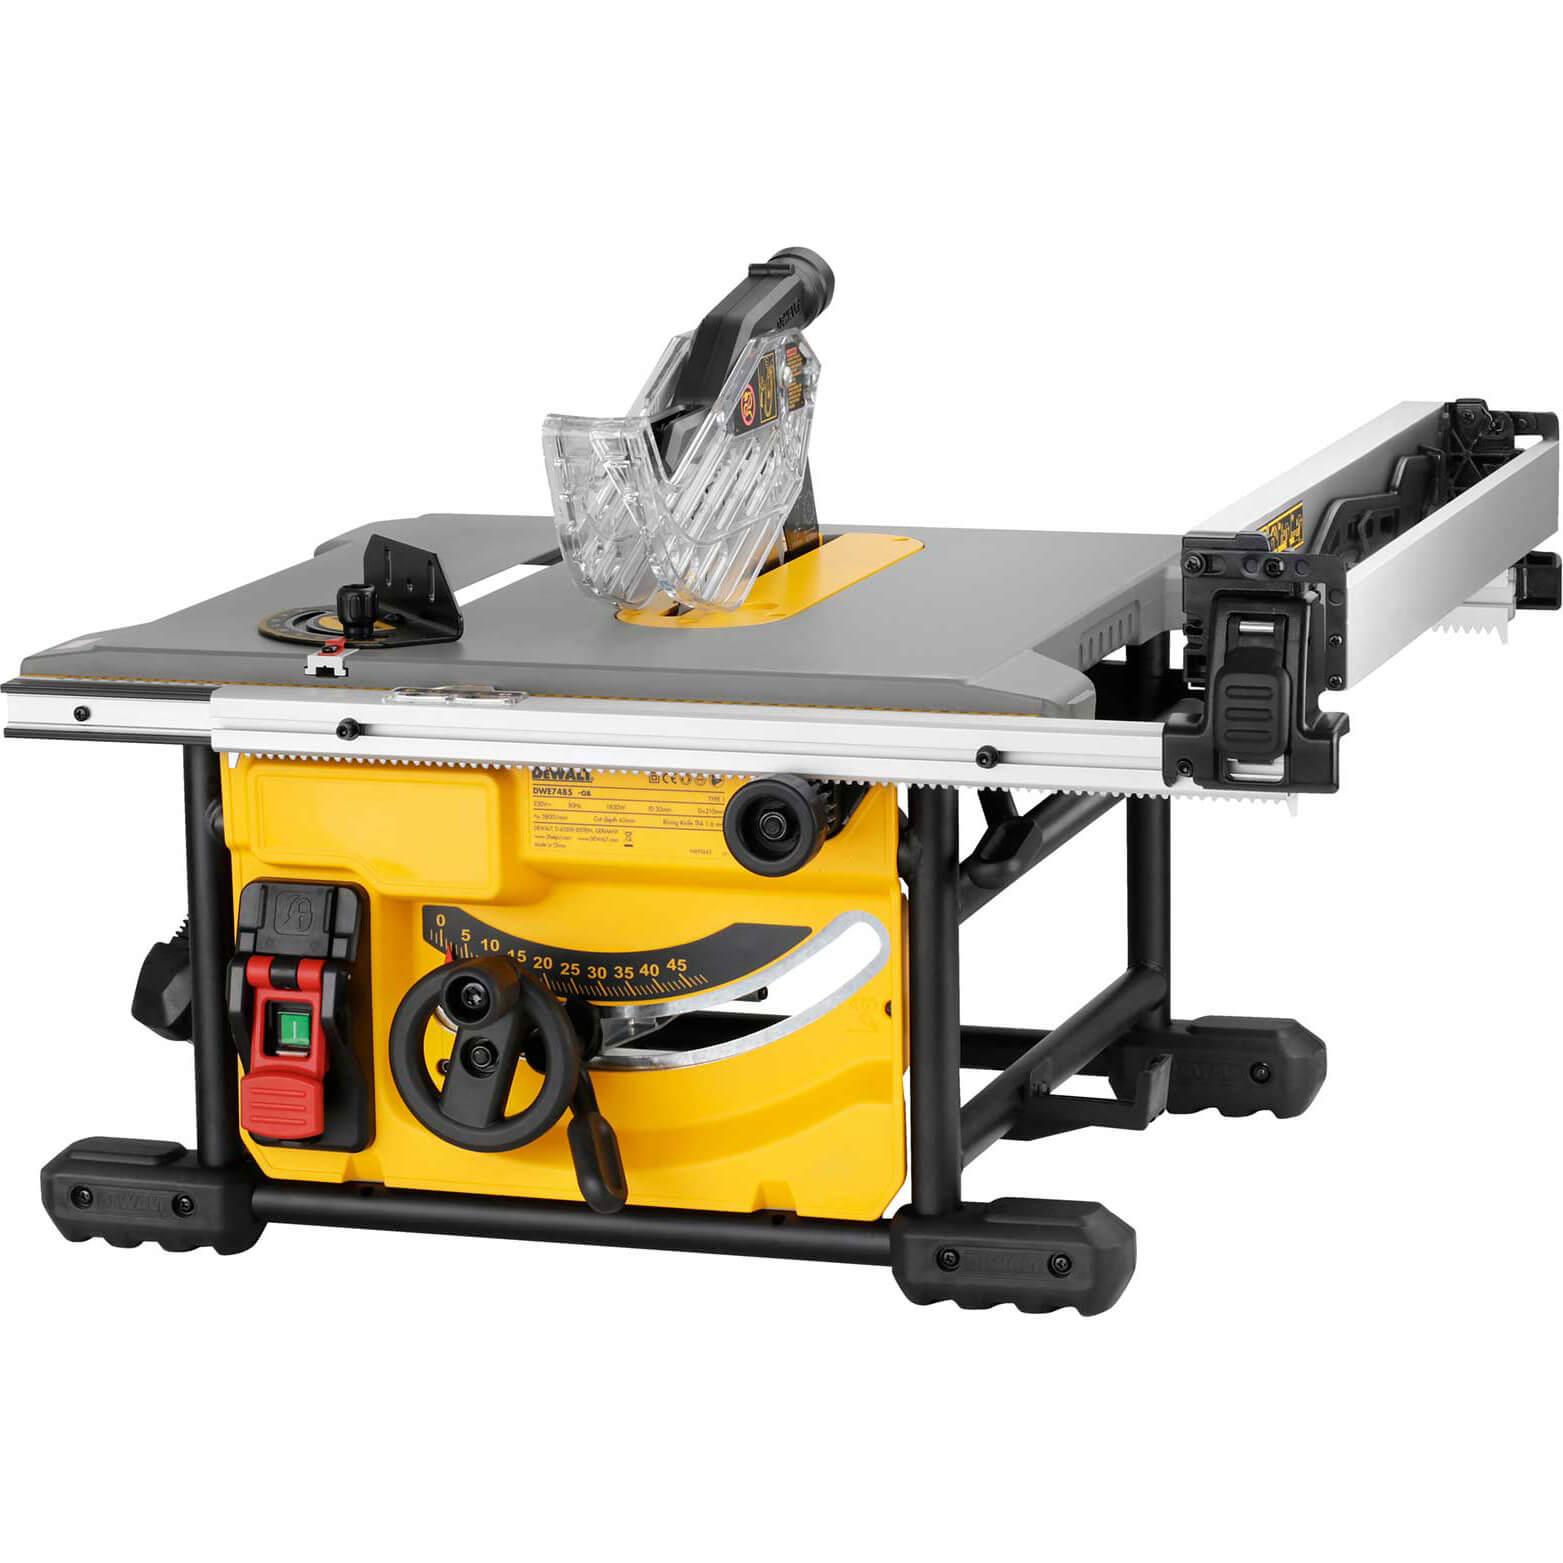 Dewalt DWE7485 Compact Table Saw 250mm | Table Saws